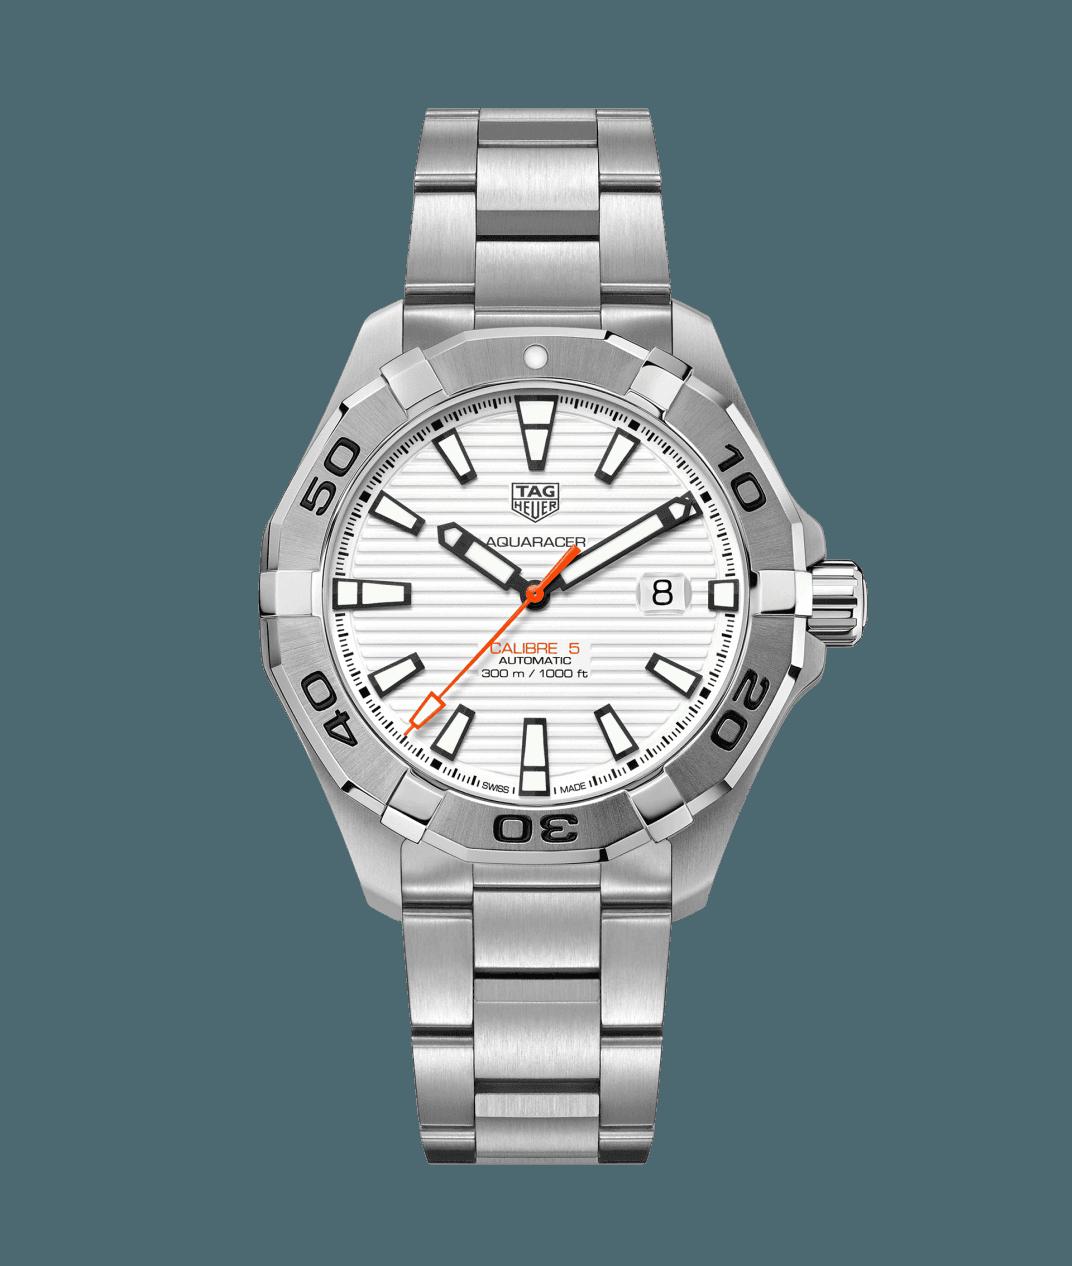 Tag-Heuer-Montre-Aquaracer-Calibre-5-43-mm-Hall-of-Time-WAY2013-BA0927